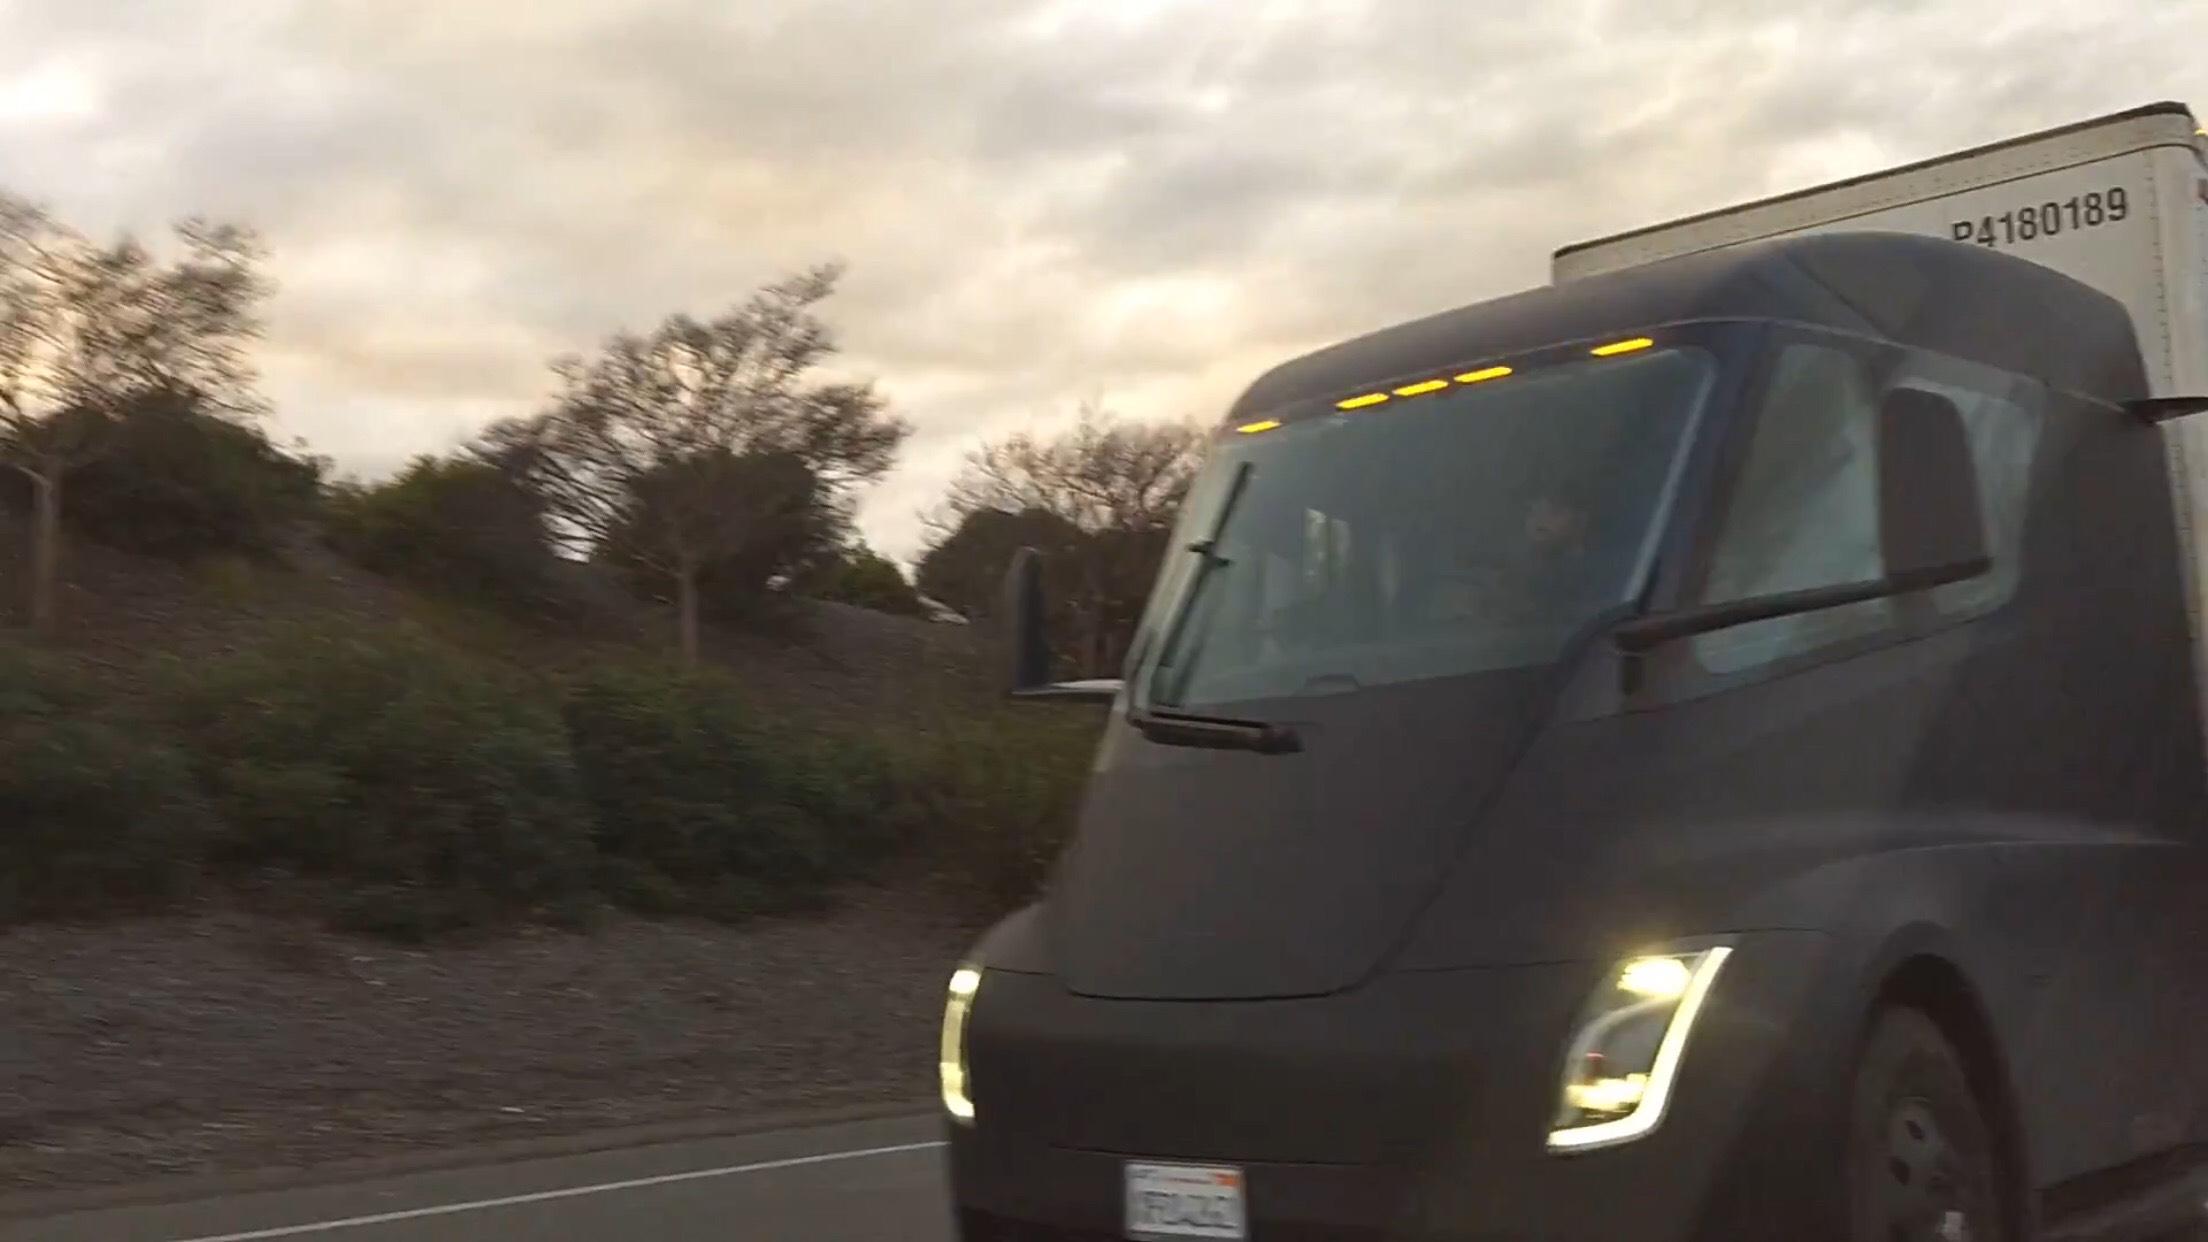 Tesla Semi Chilling highway 2 [Credit: Sergey MoldovanAmerican/YouTube]